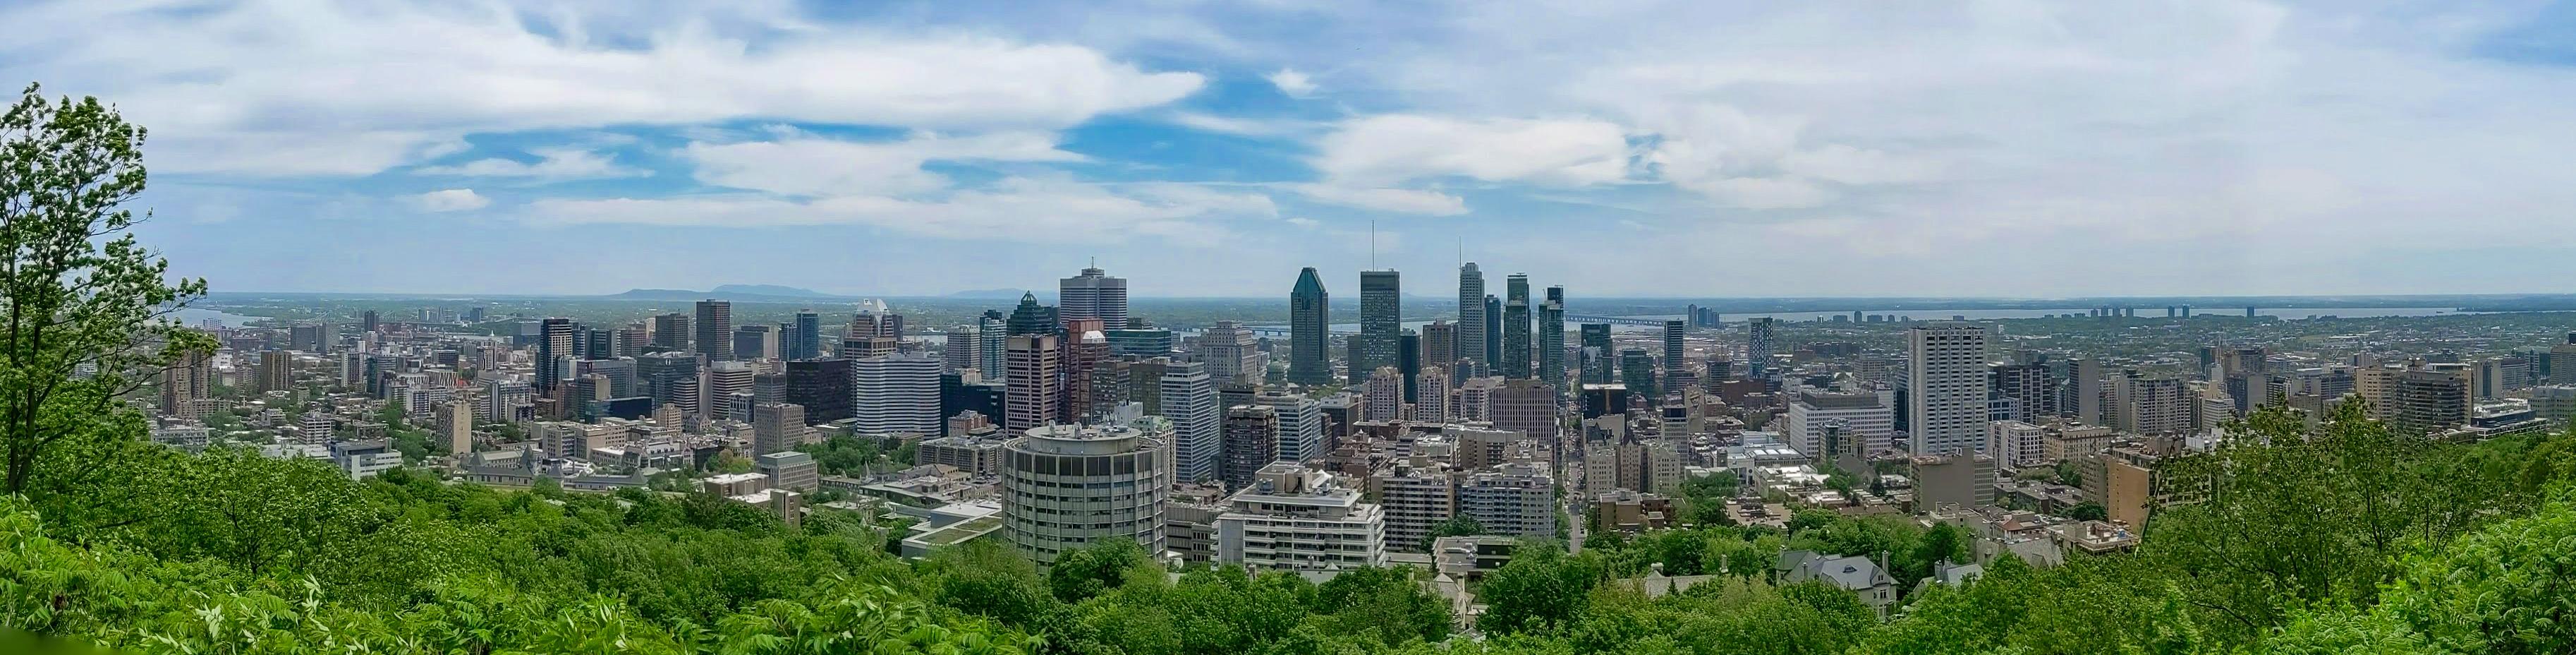 Panorama Montreal, vanaf de Mont Royal